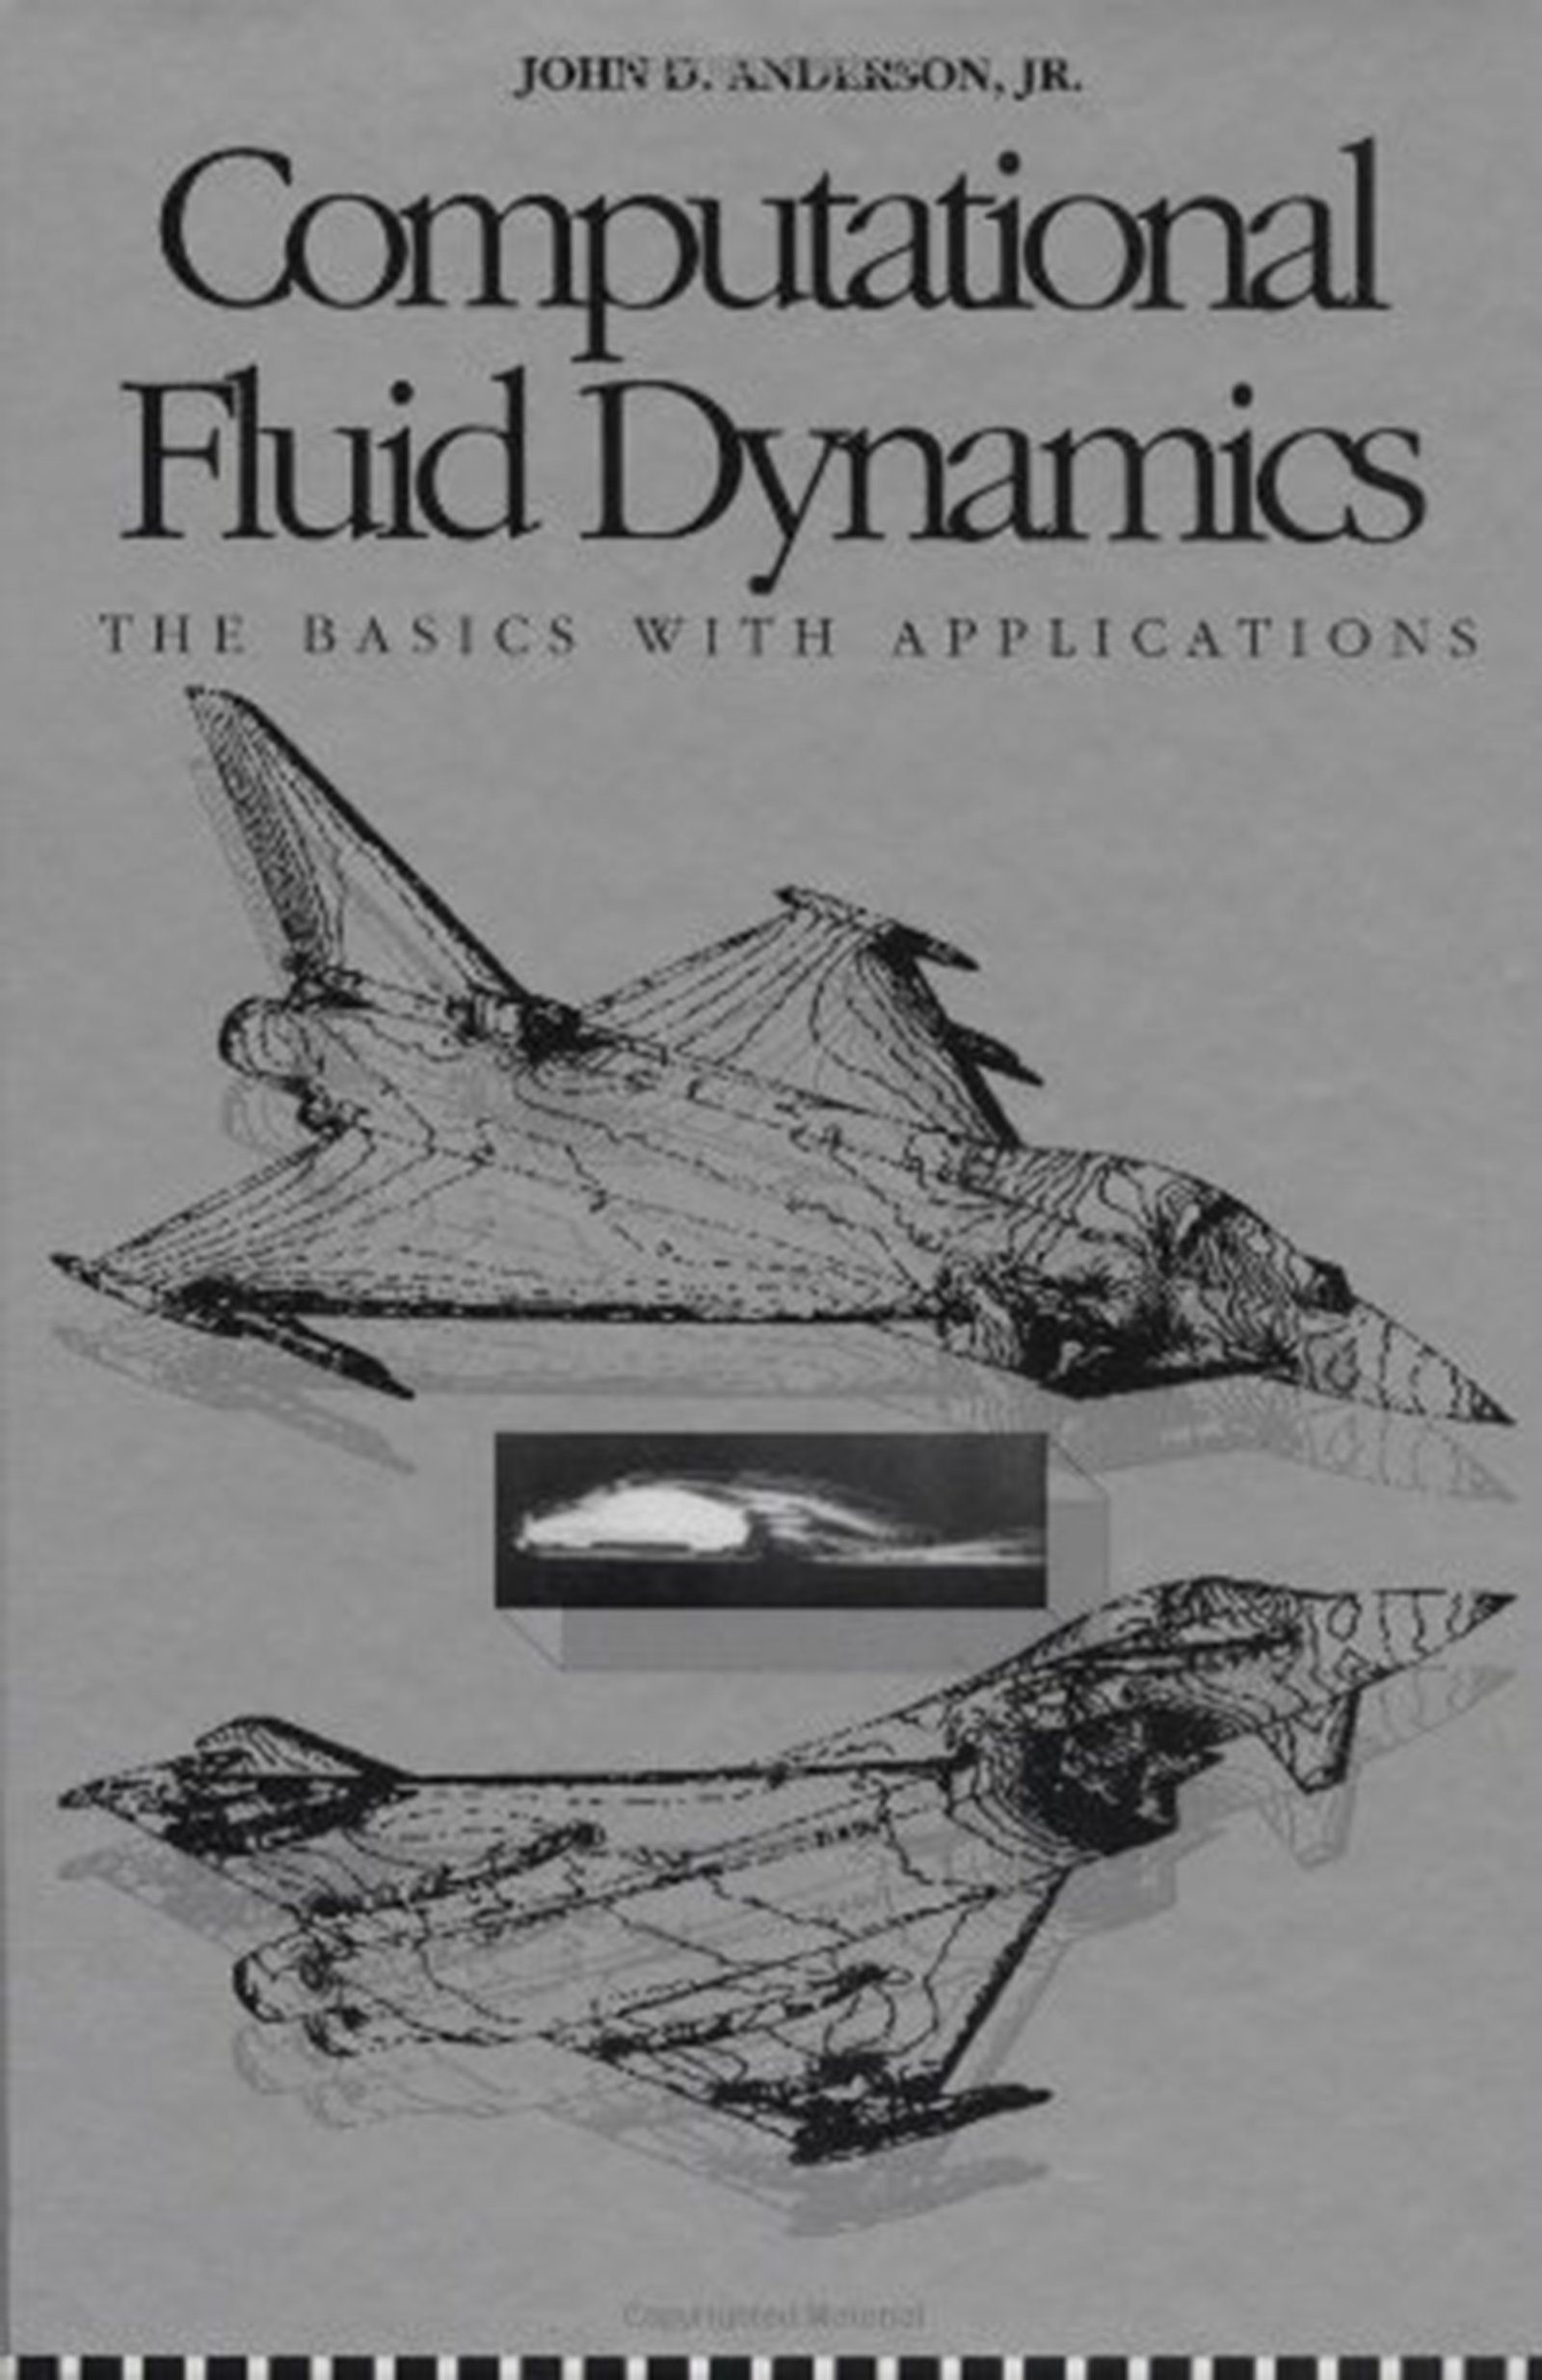 Computational Fluid Dynamics: The Basics With Applications (6th Ed.) por John D. Anderson Gratis